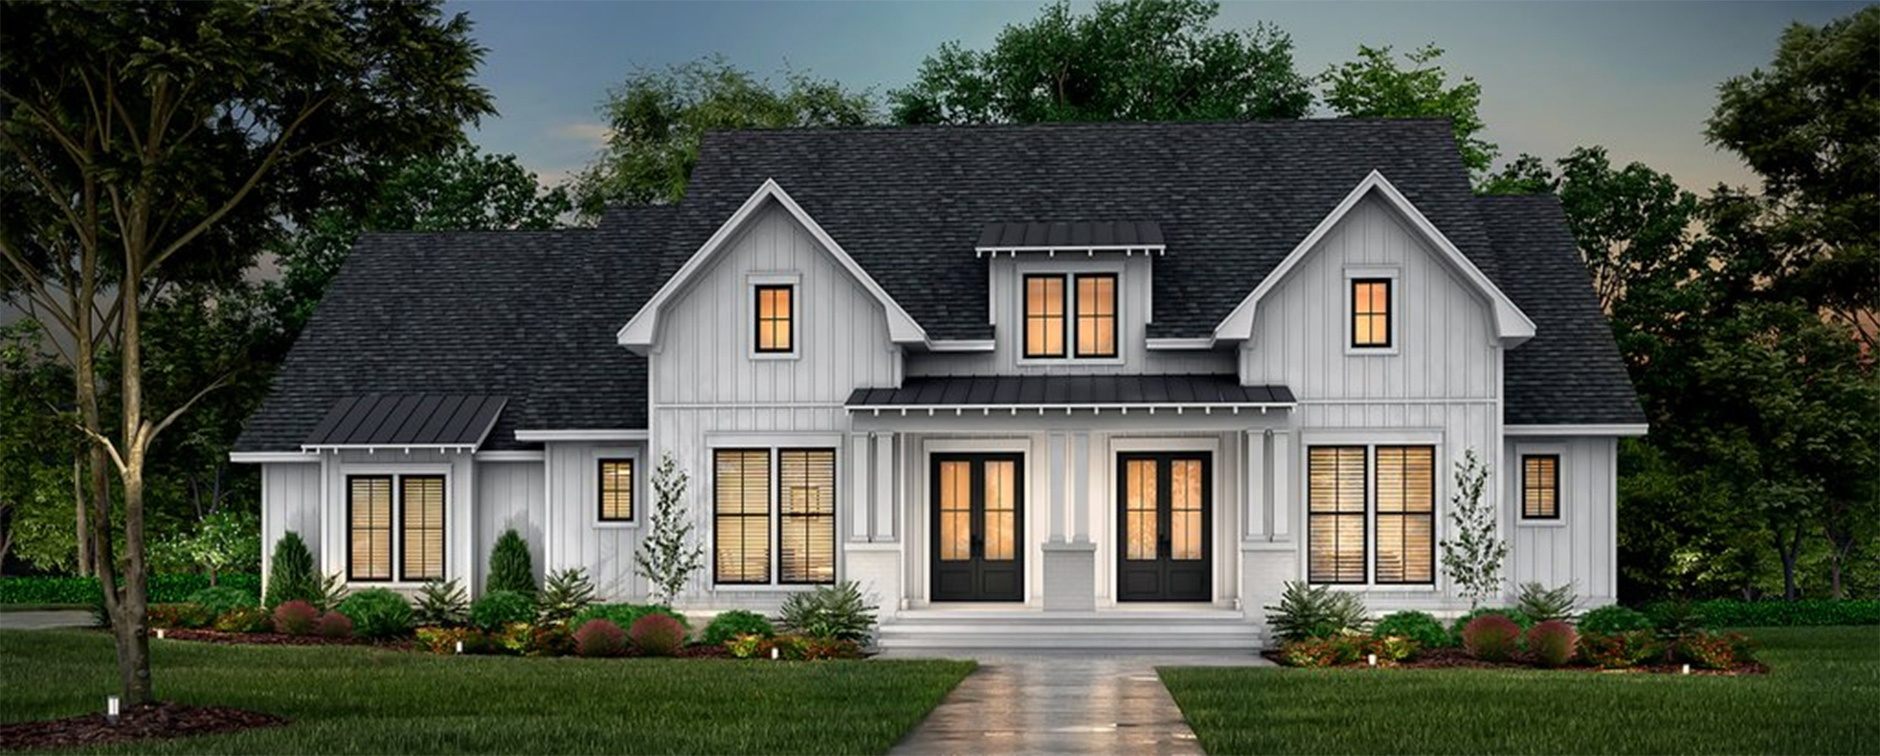 Explore 3 Bedroom House Plans